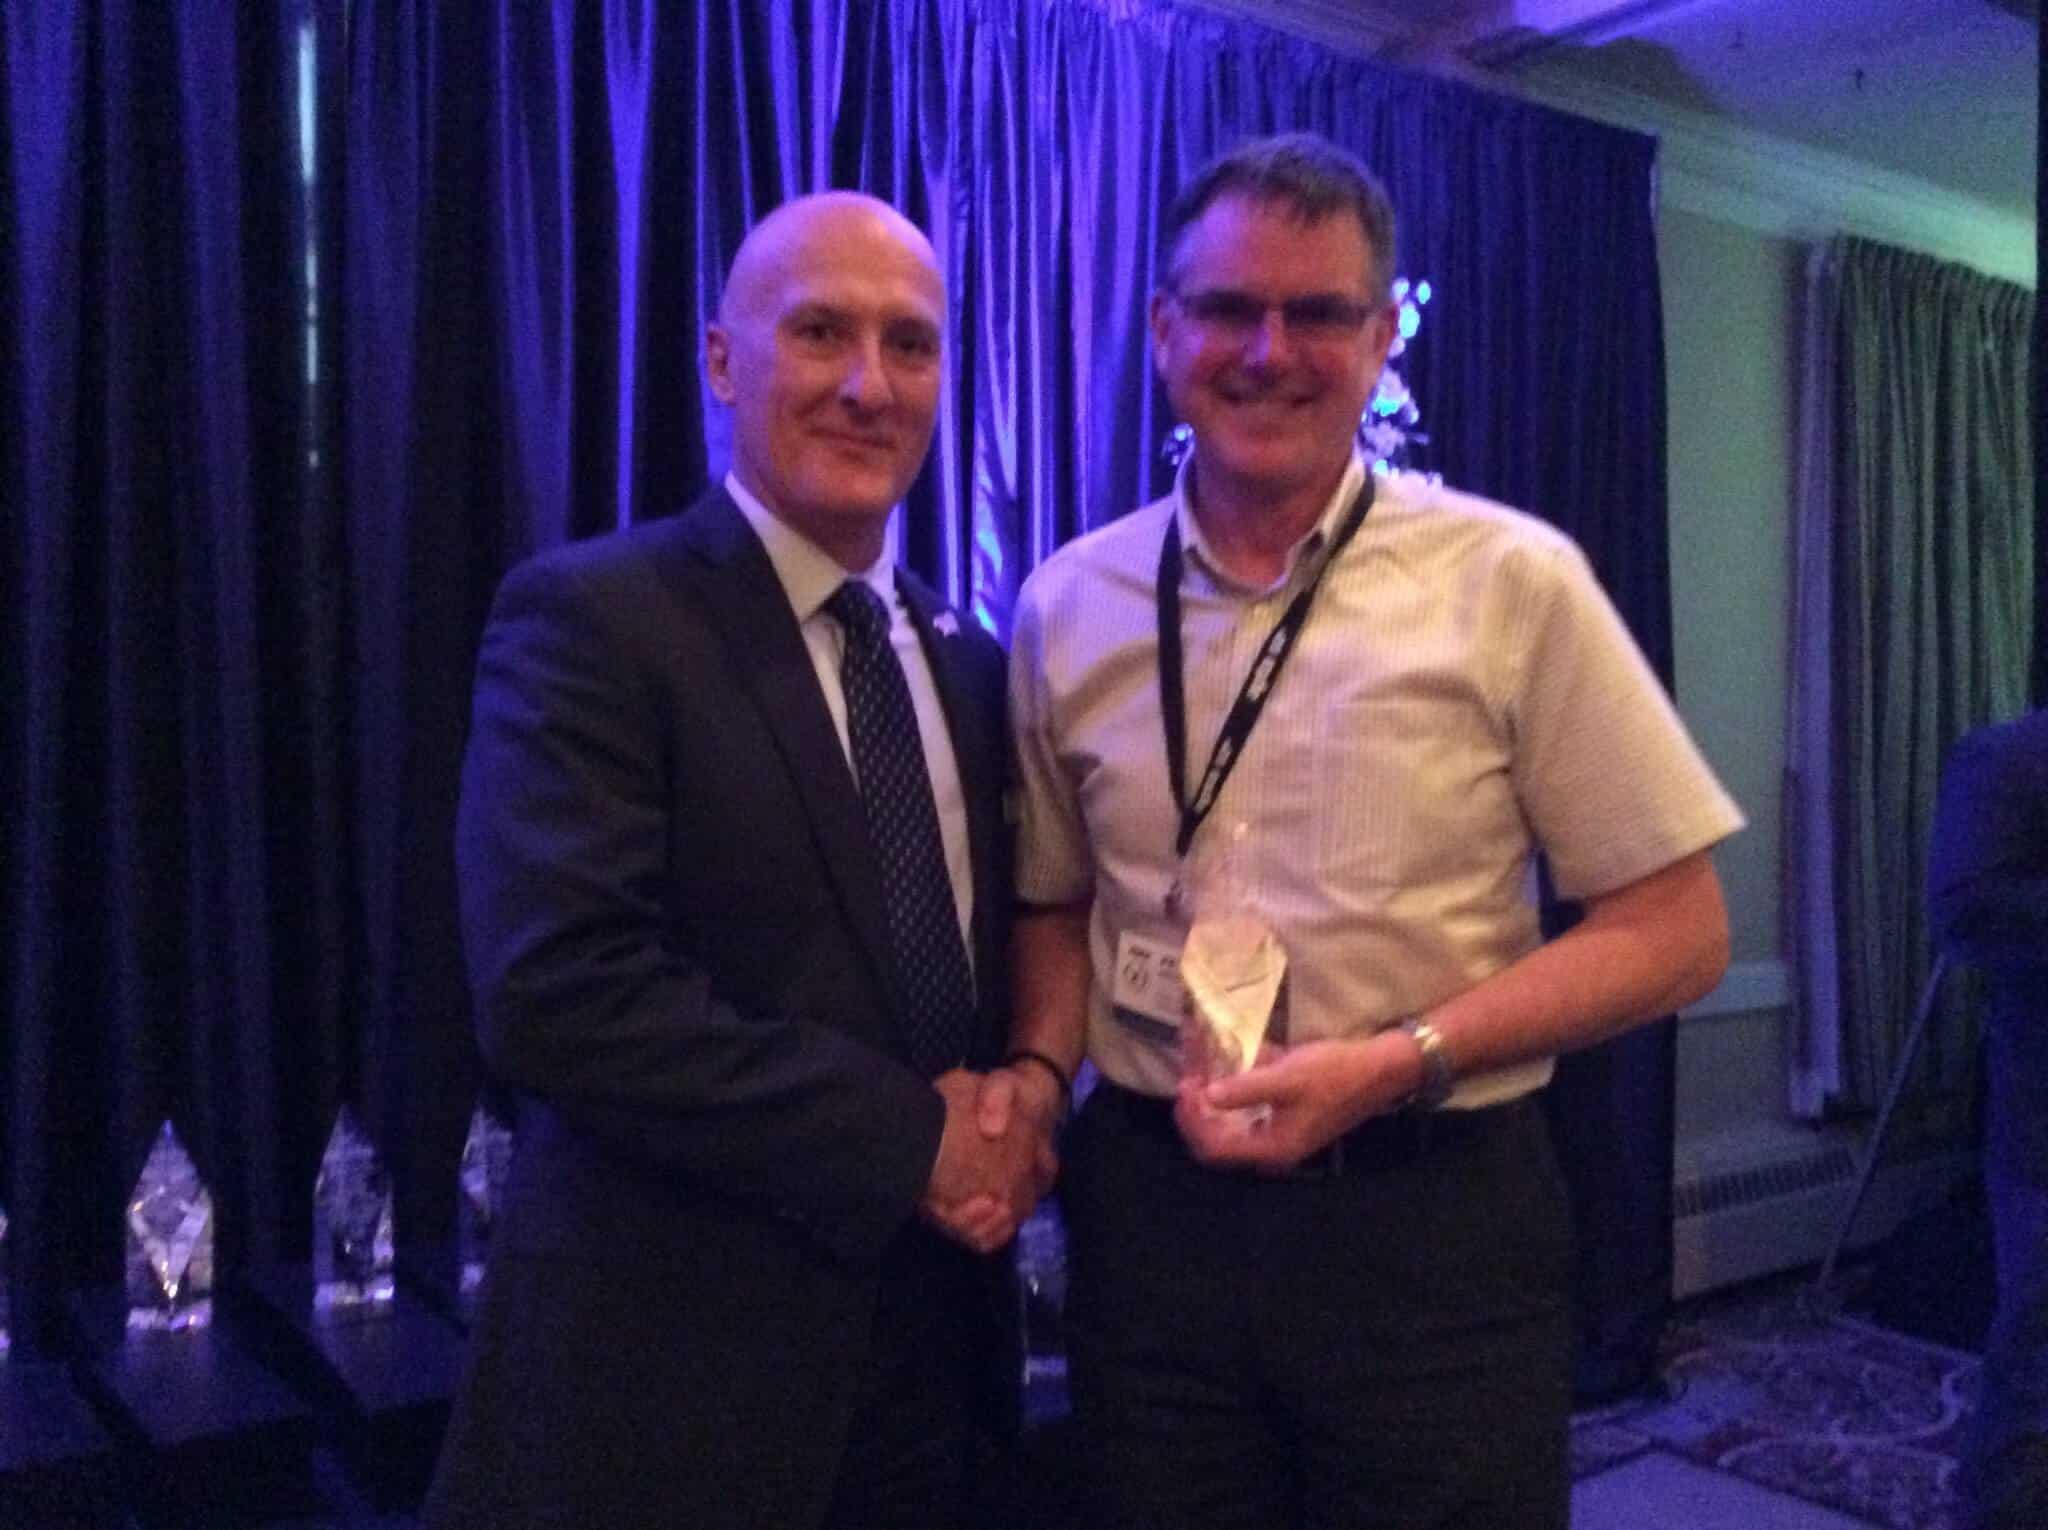 JM_Peter Macgillivray receiving award